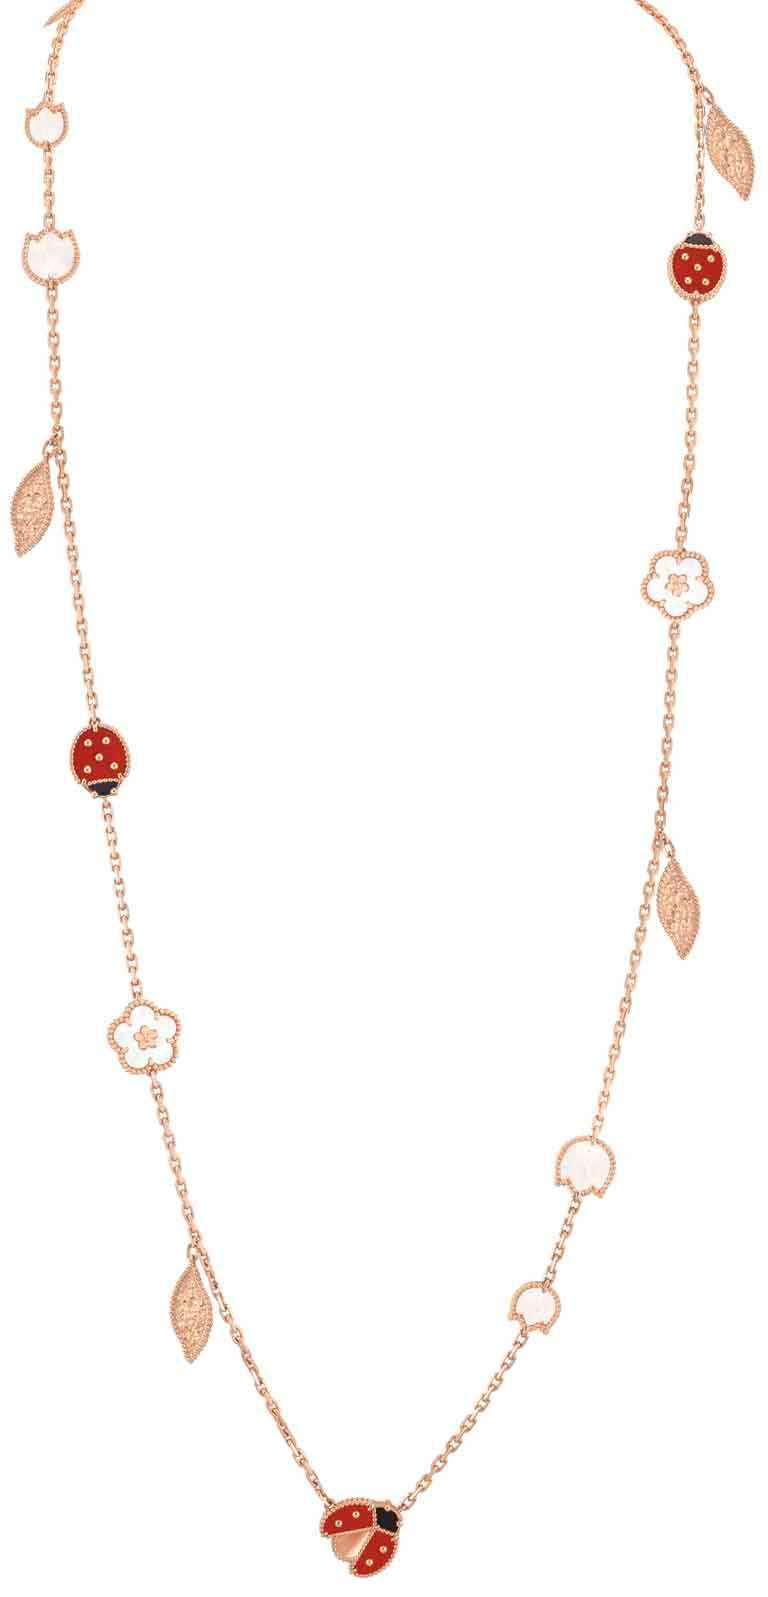 Van Cleef & Arpels「Lucky Spring」系列,15枚綴飾玫瑰金長項鍊╱505,000元。(圖╱Van Cleef & Arpels提供)